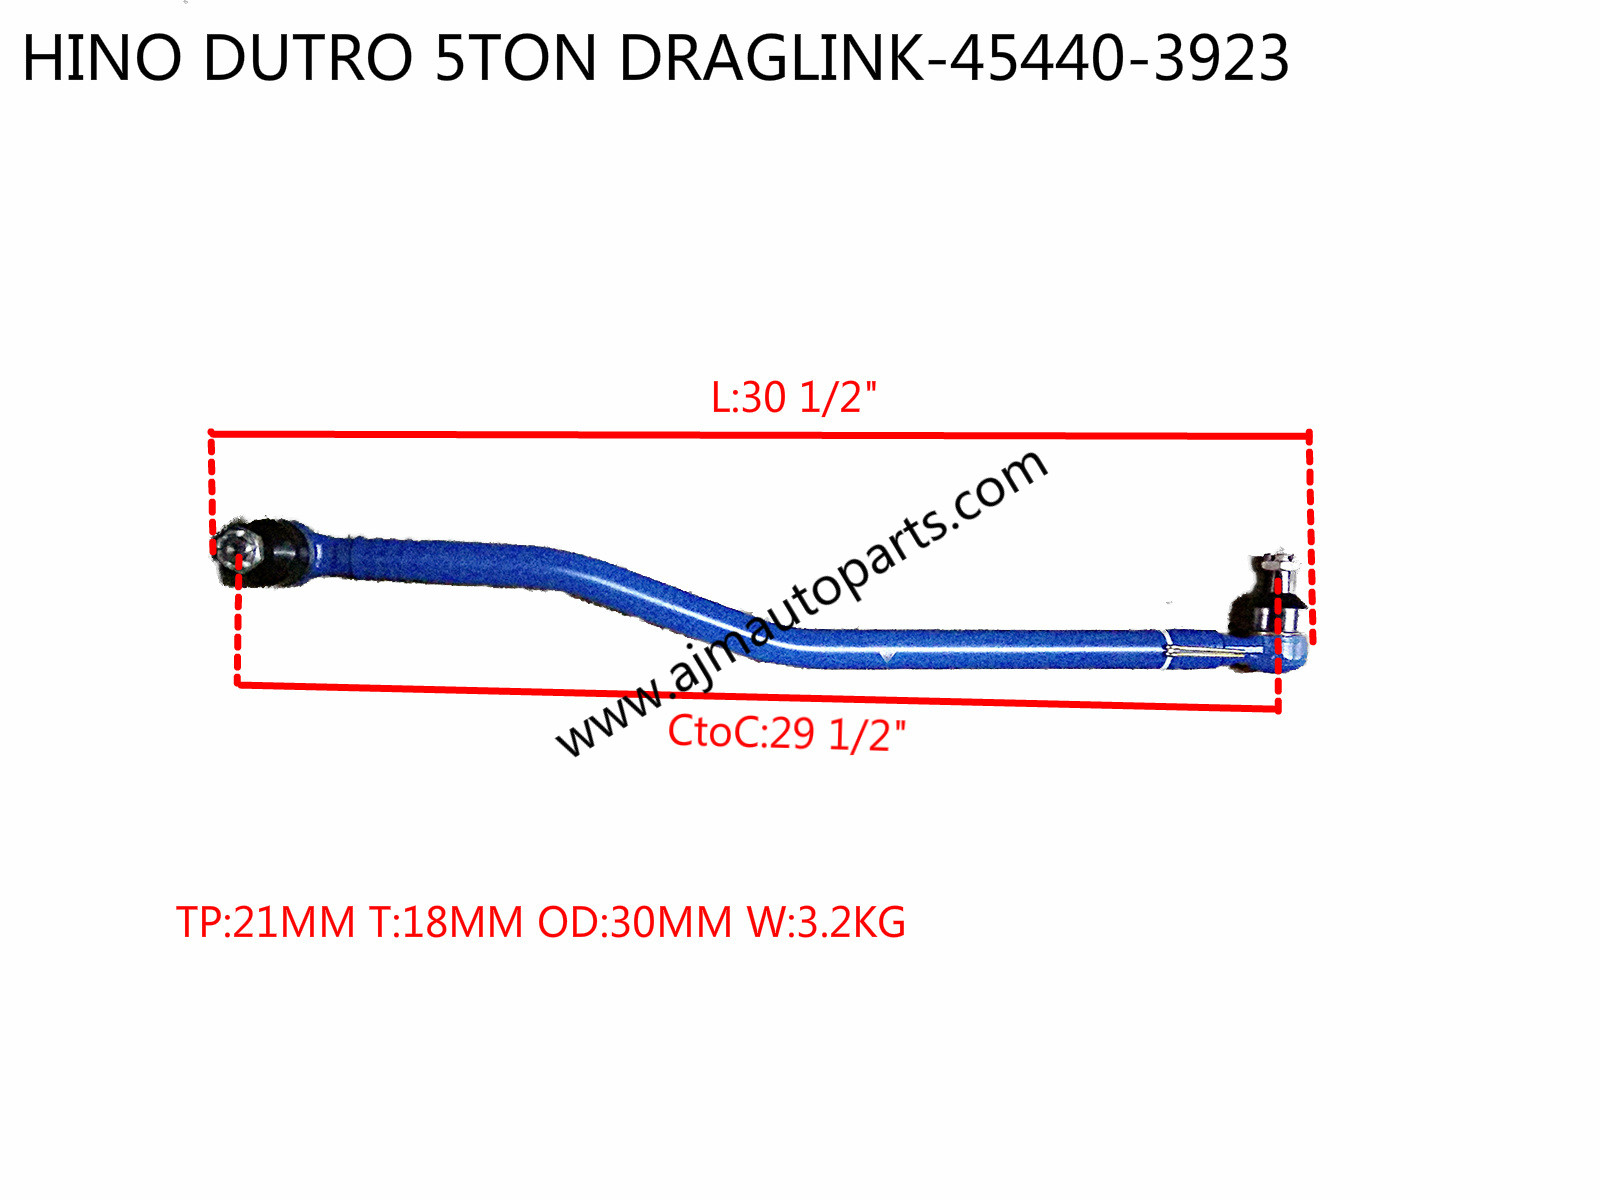 HINO DUTRO 5TON DRAGLINK-45440-39236